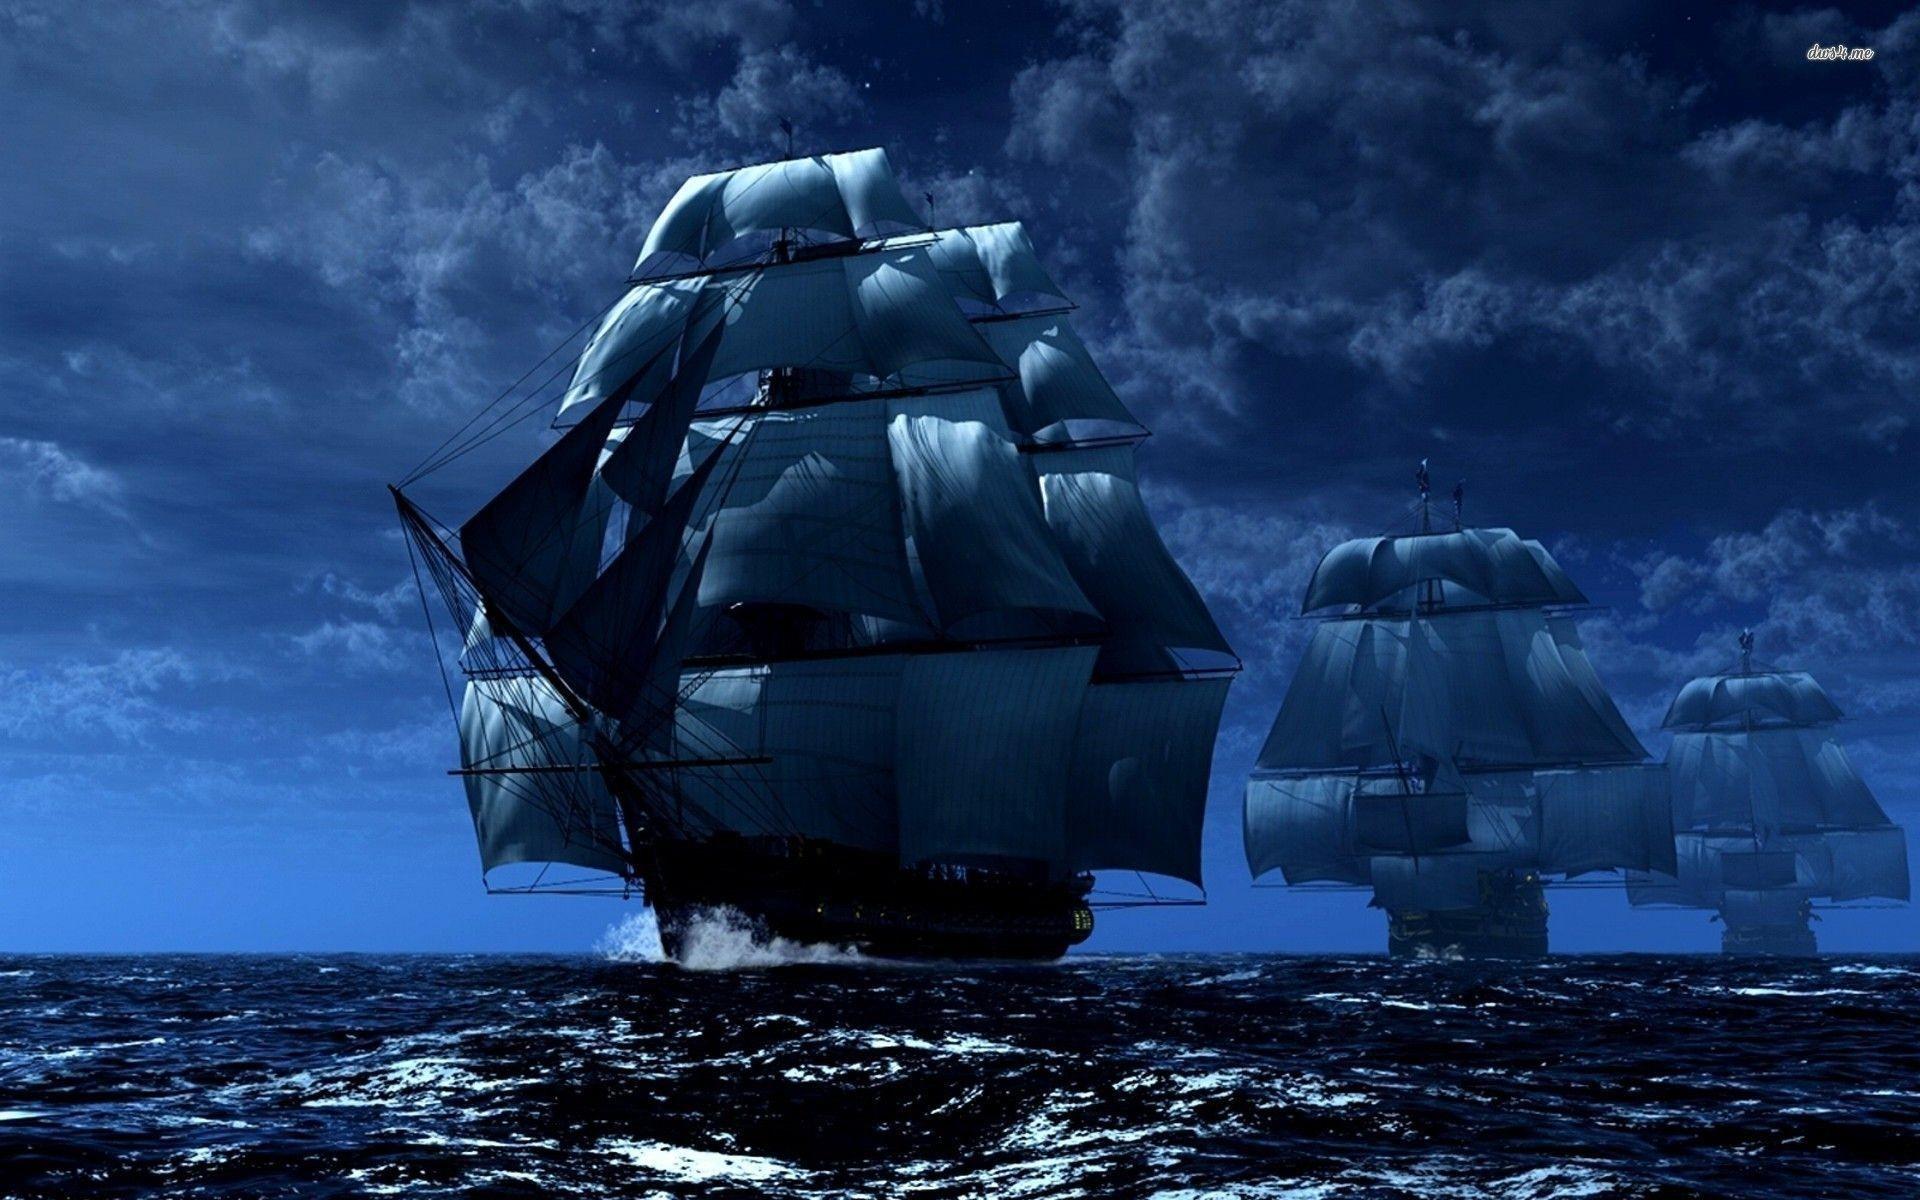 Pirate ships wallpaper – Fantasy wallpapers – #20496